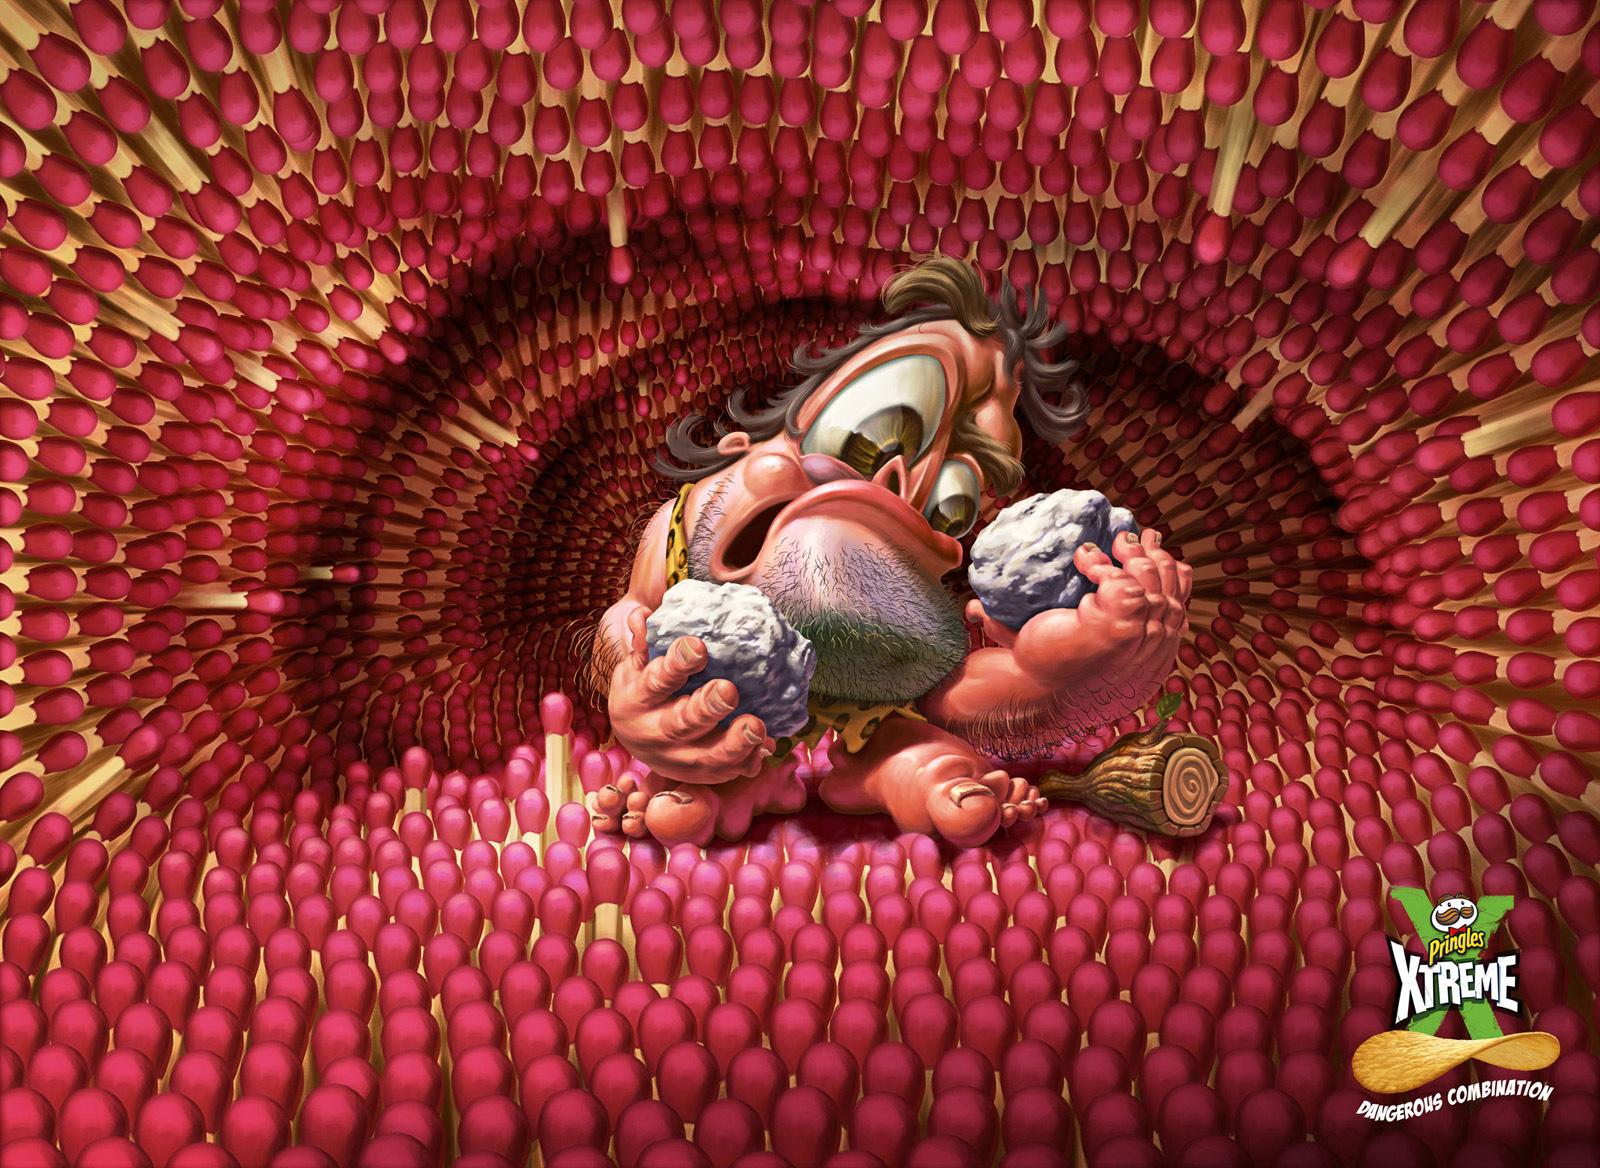 http//www.ibelieveinadv.com/commons/caveman-pringles-xtreme_1.jpg